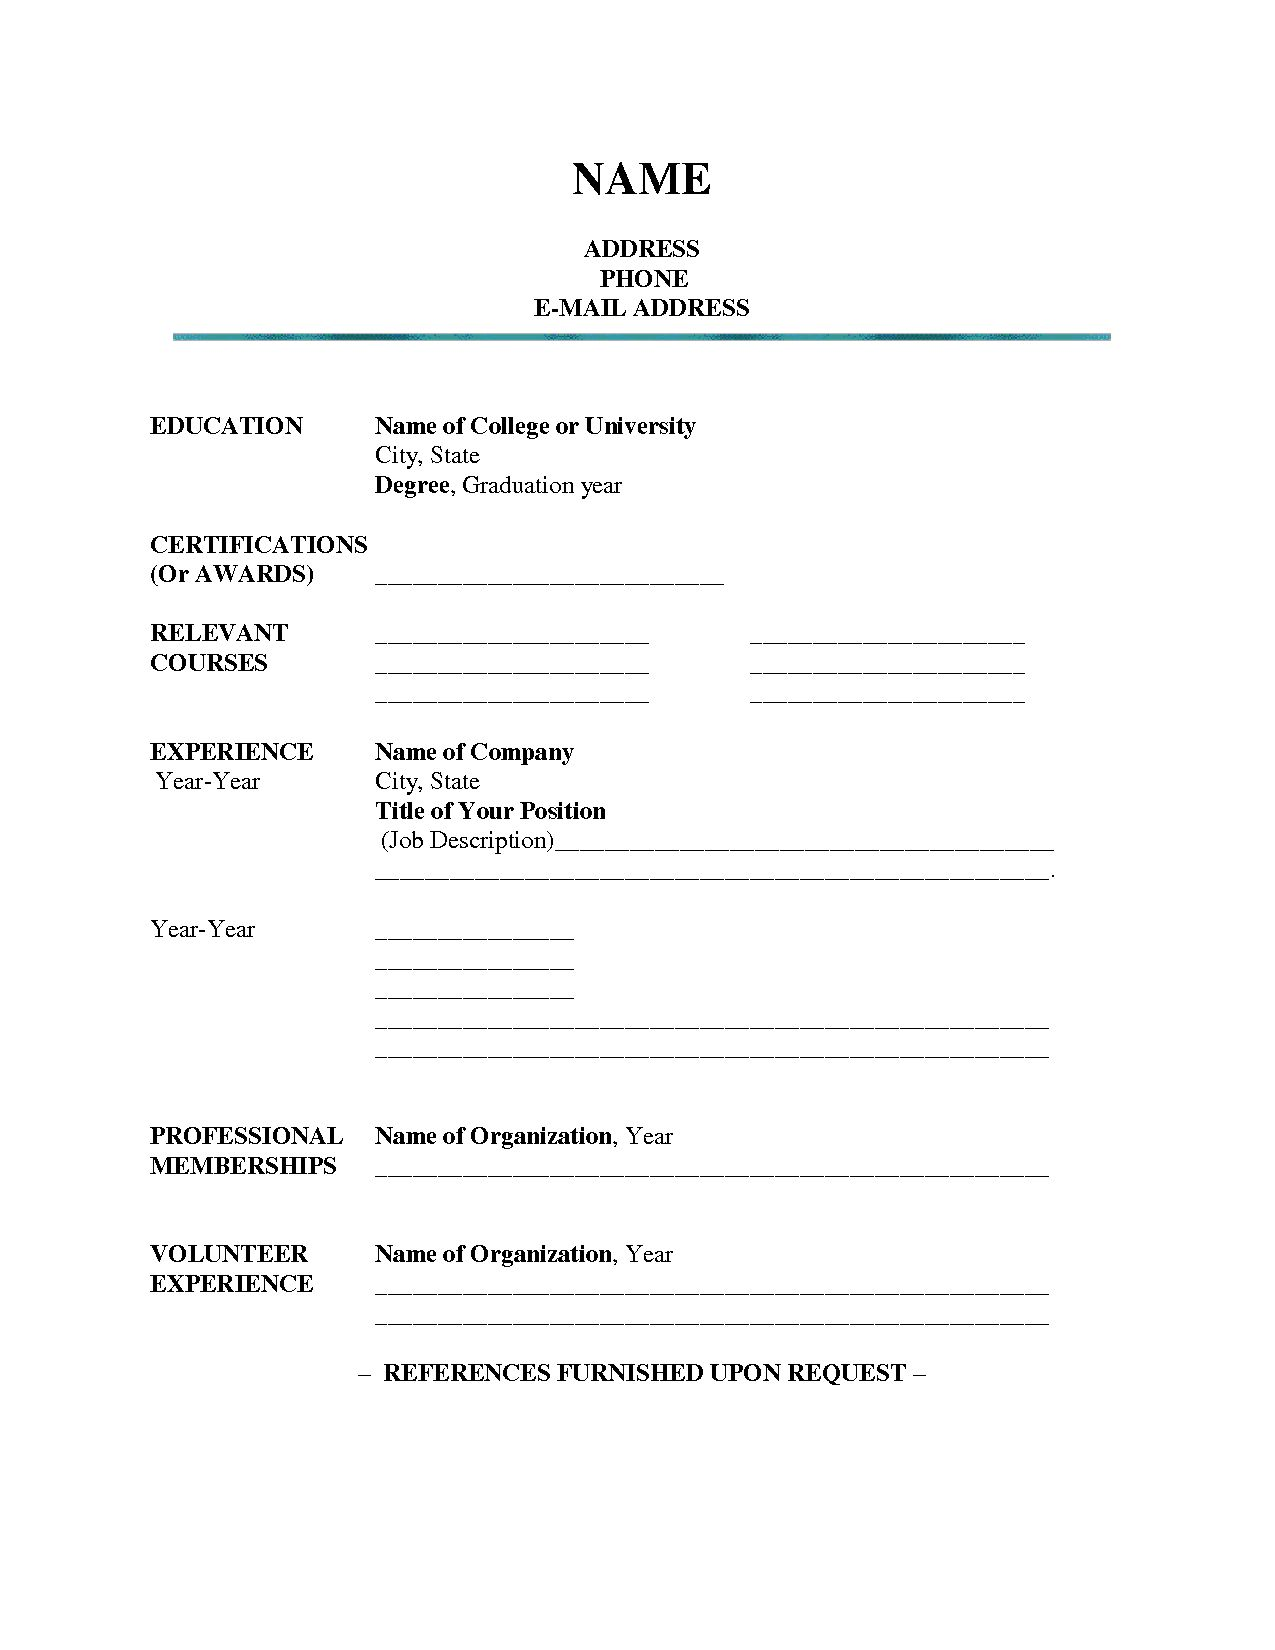 Resume Format Blank Blank Format Resume Resumeformat With